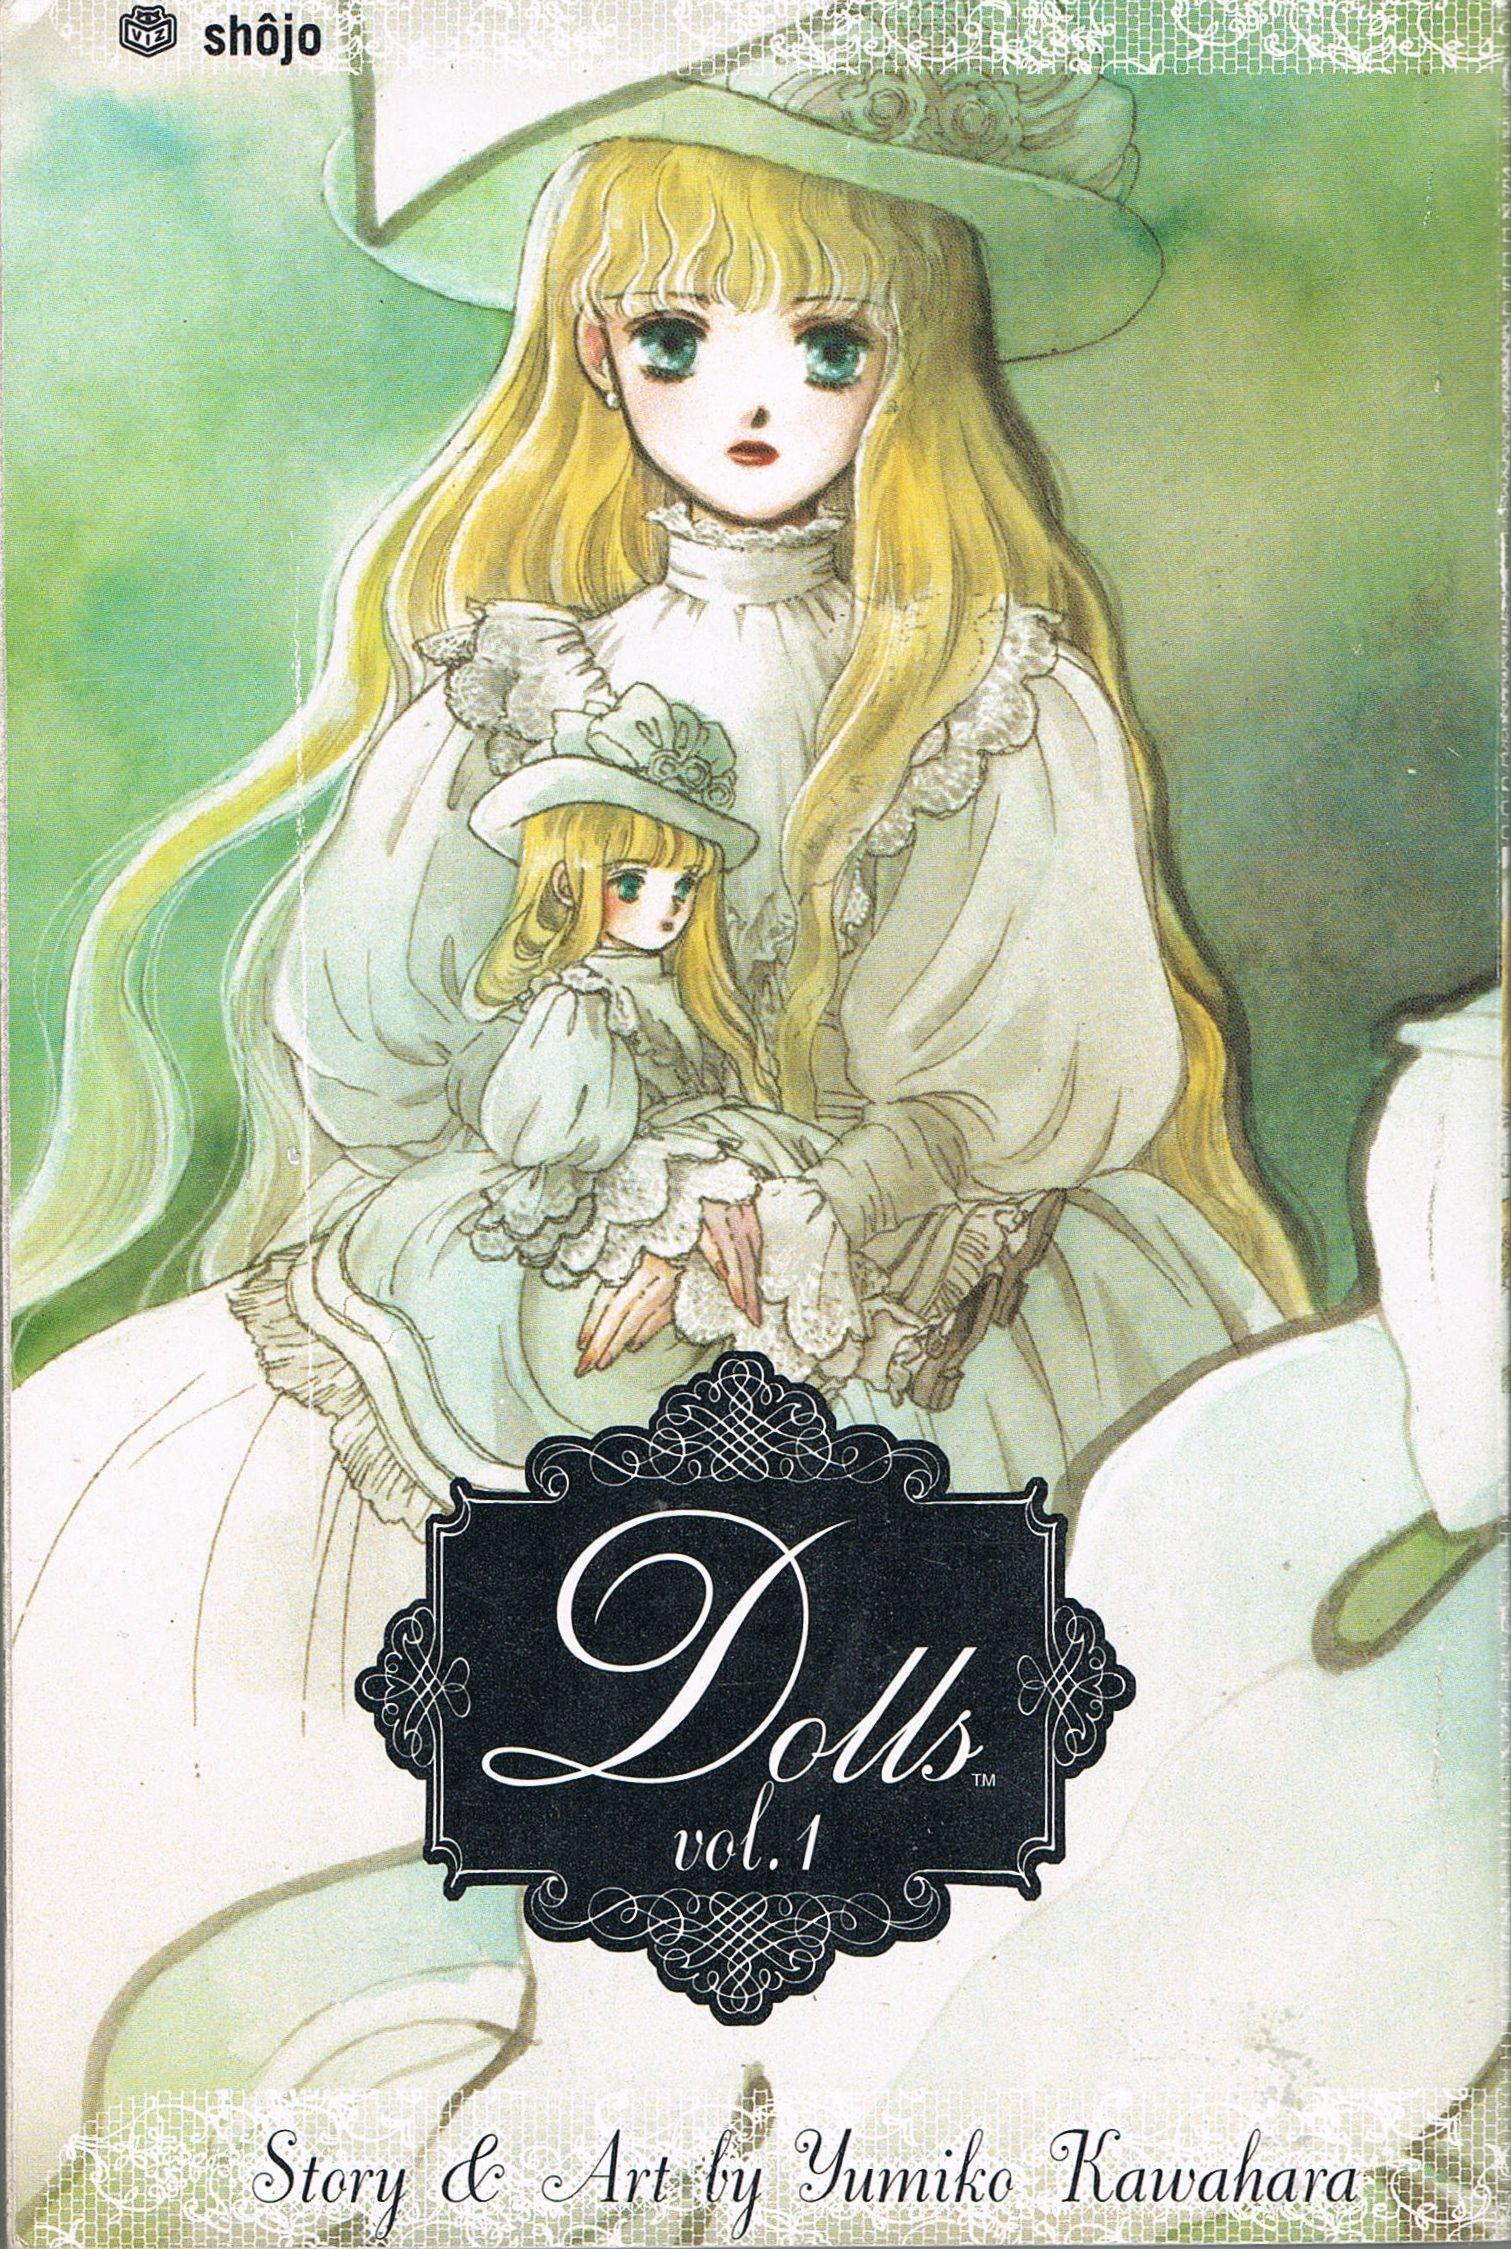 Dolls vol 1 (2004) by Yumiko Kawahara. For once the blurb ...